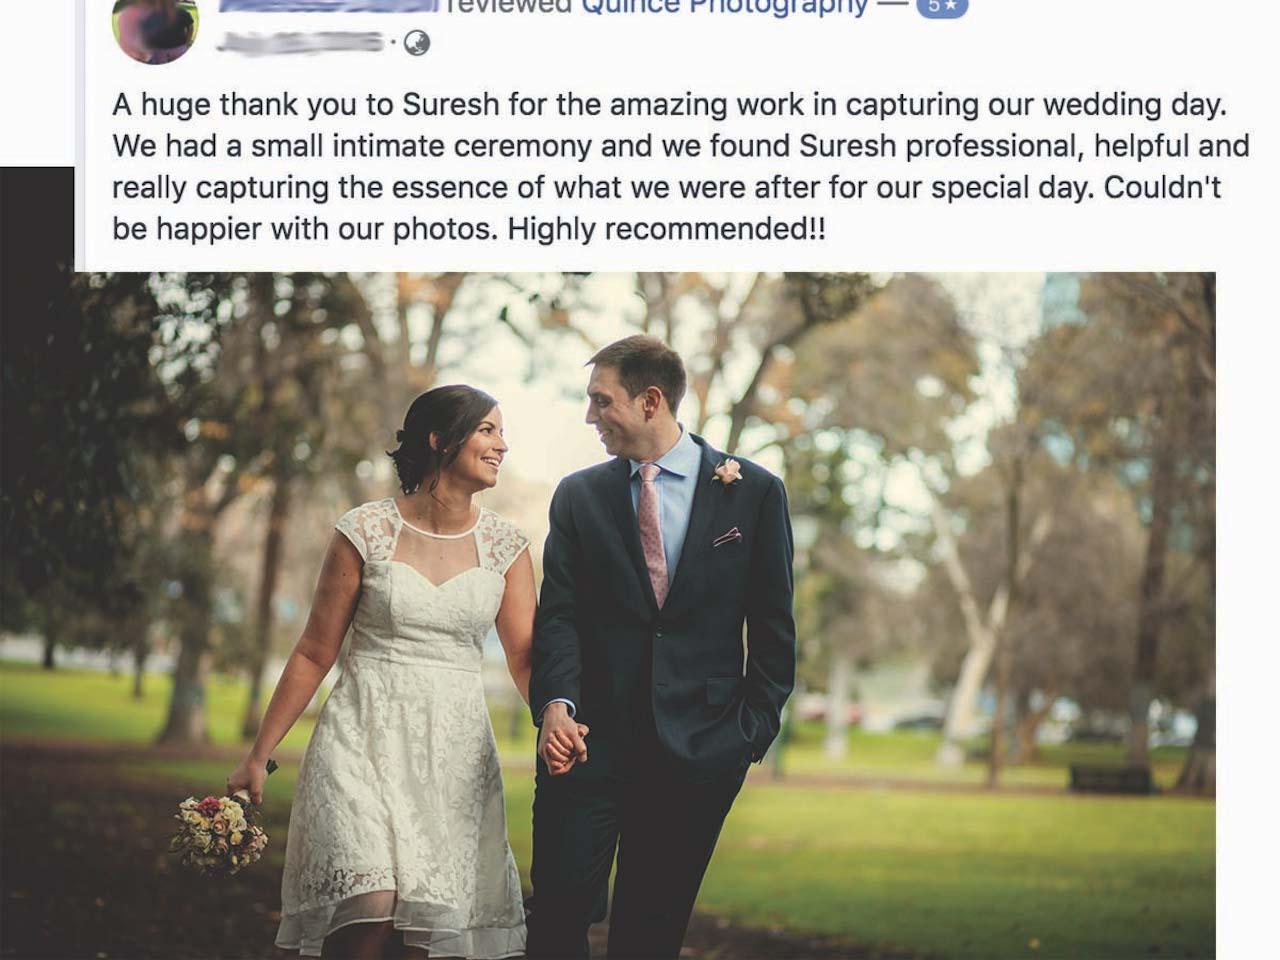 Melbourne wedding photo review 3.jpg